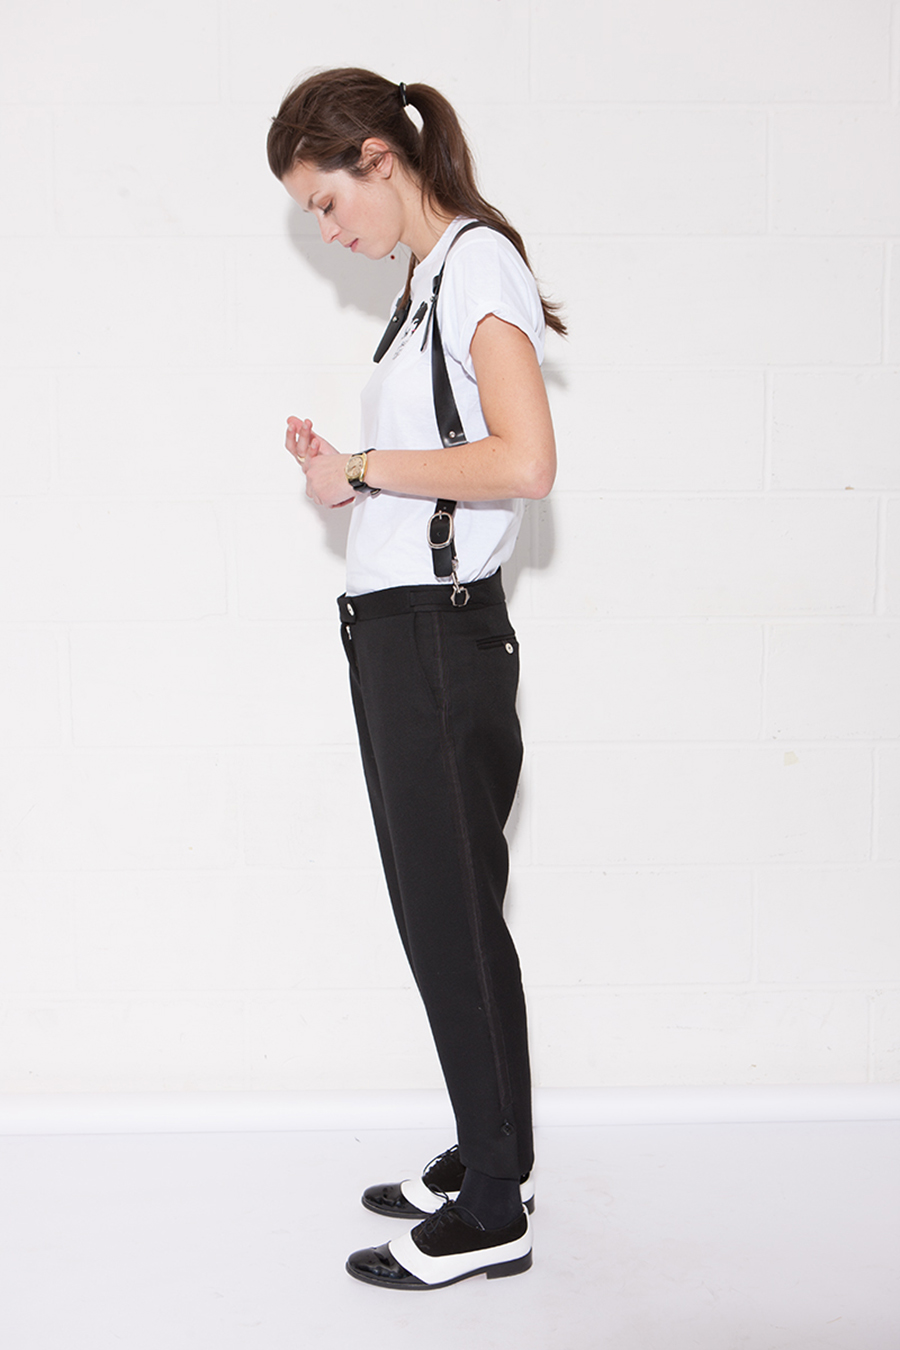 leather braces, dress trousers.jpg